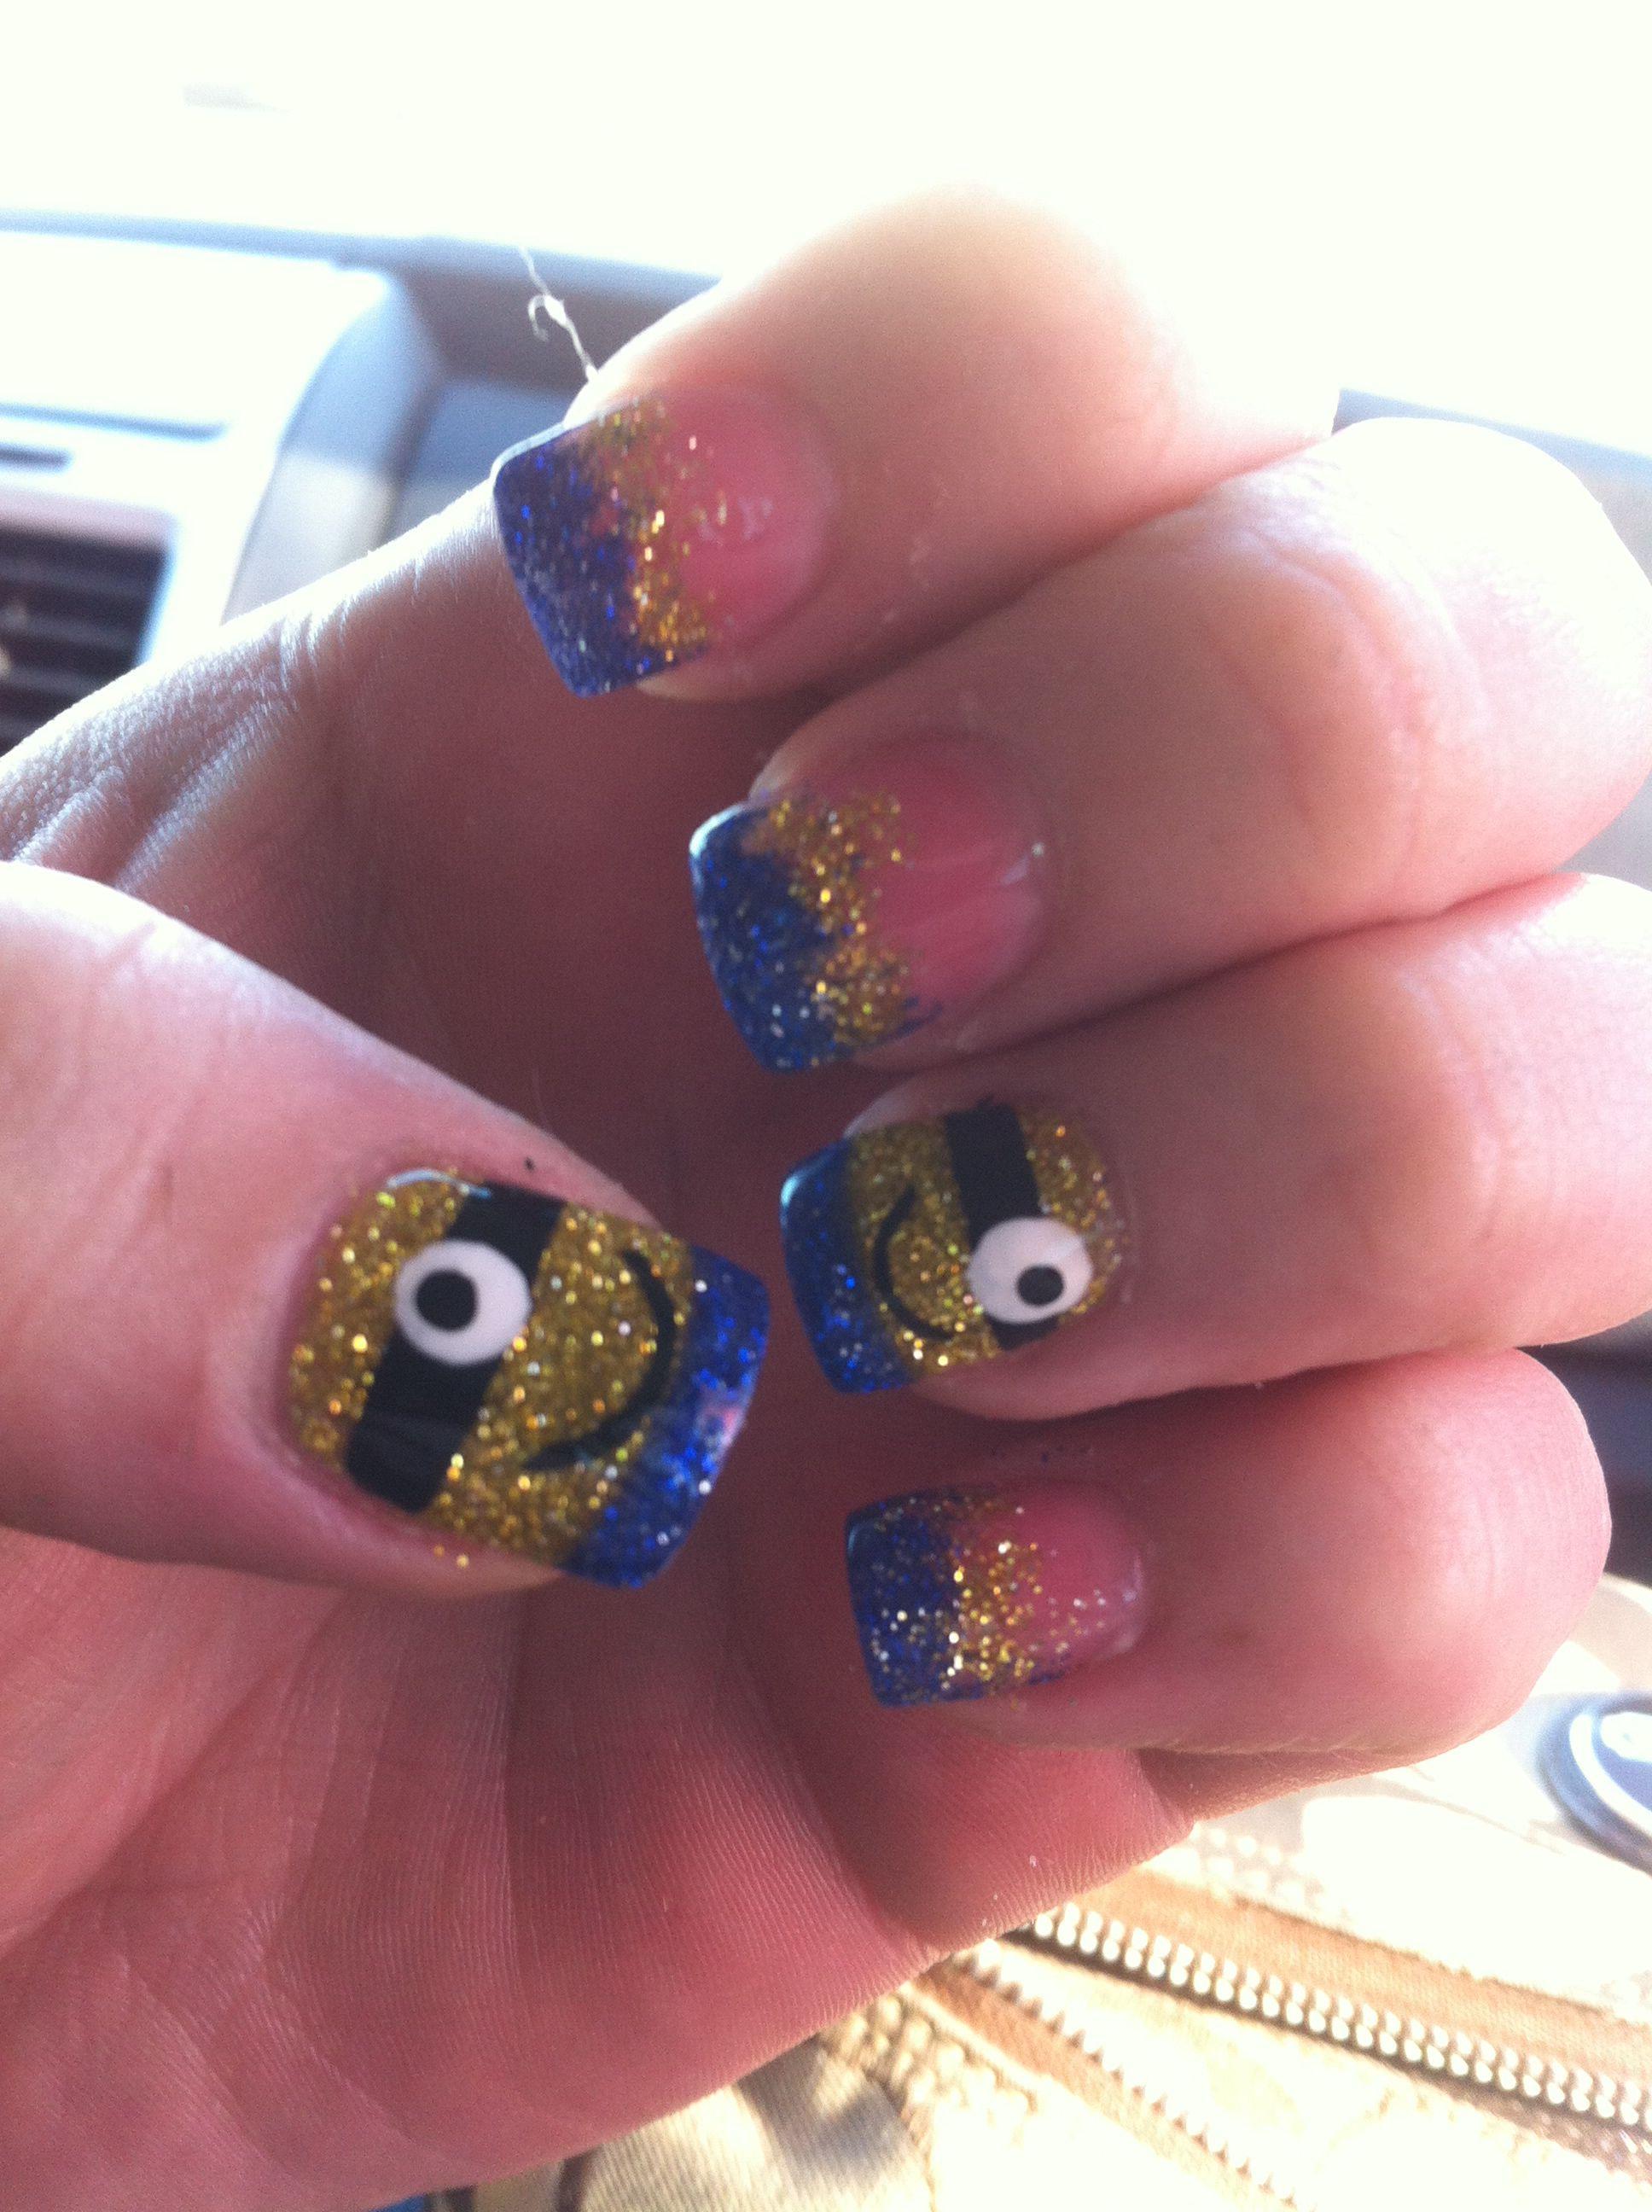 despicable nails. minion